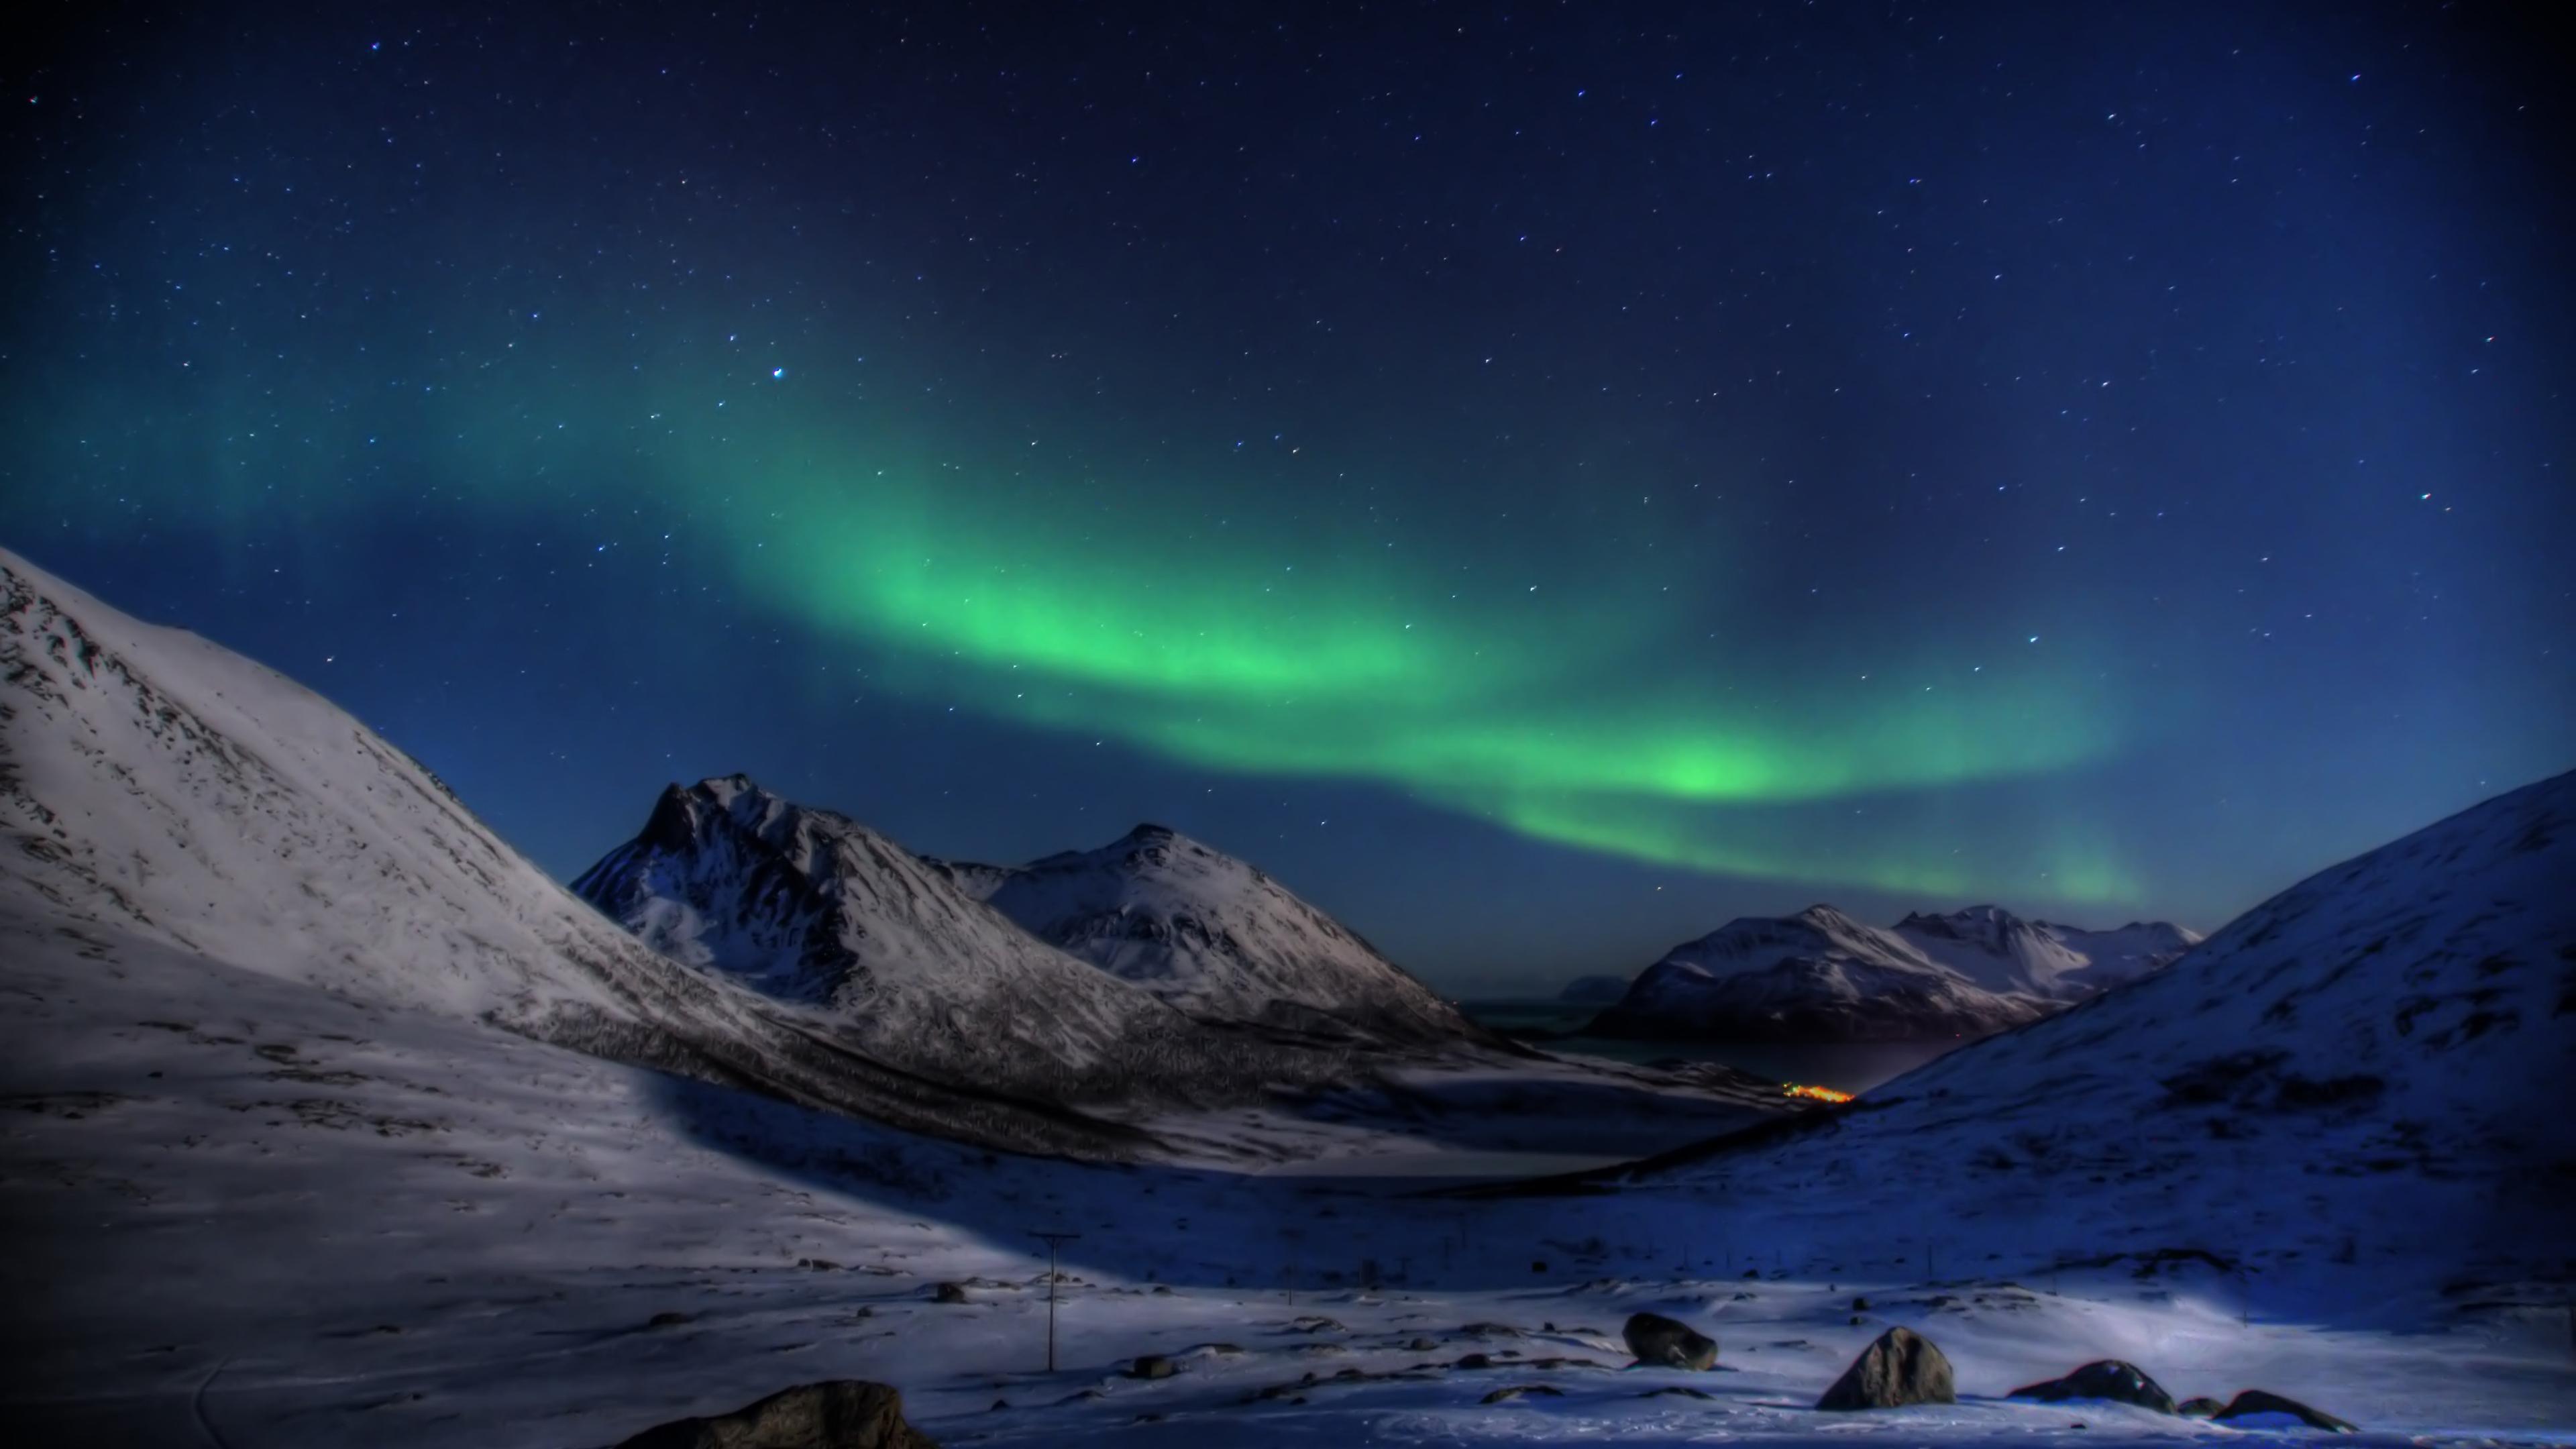 Aurora Borealis 4k Ultra HD Wallpaper and Background ...